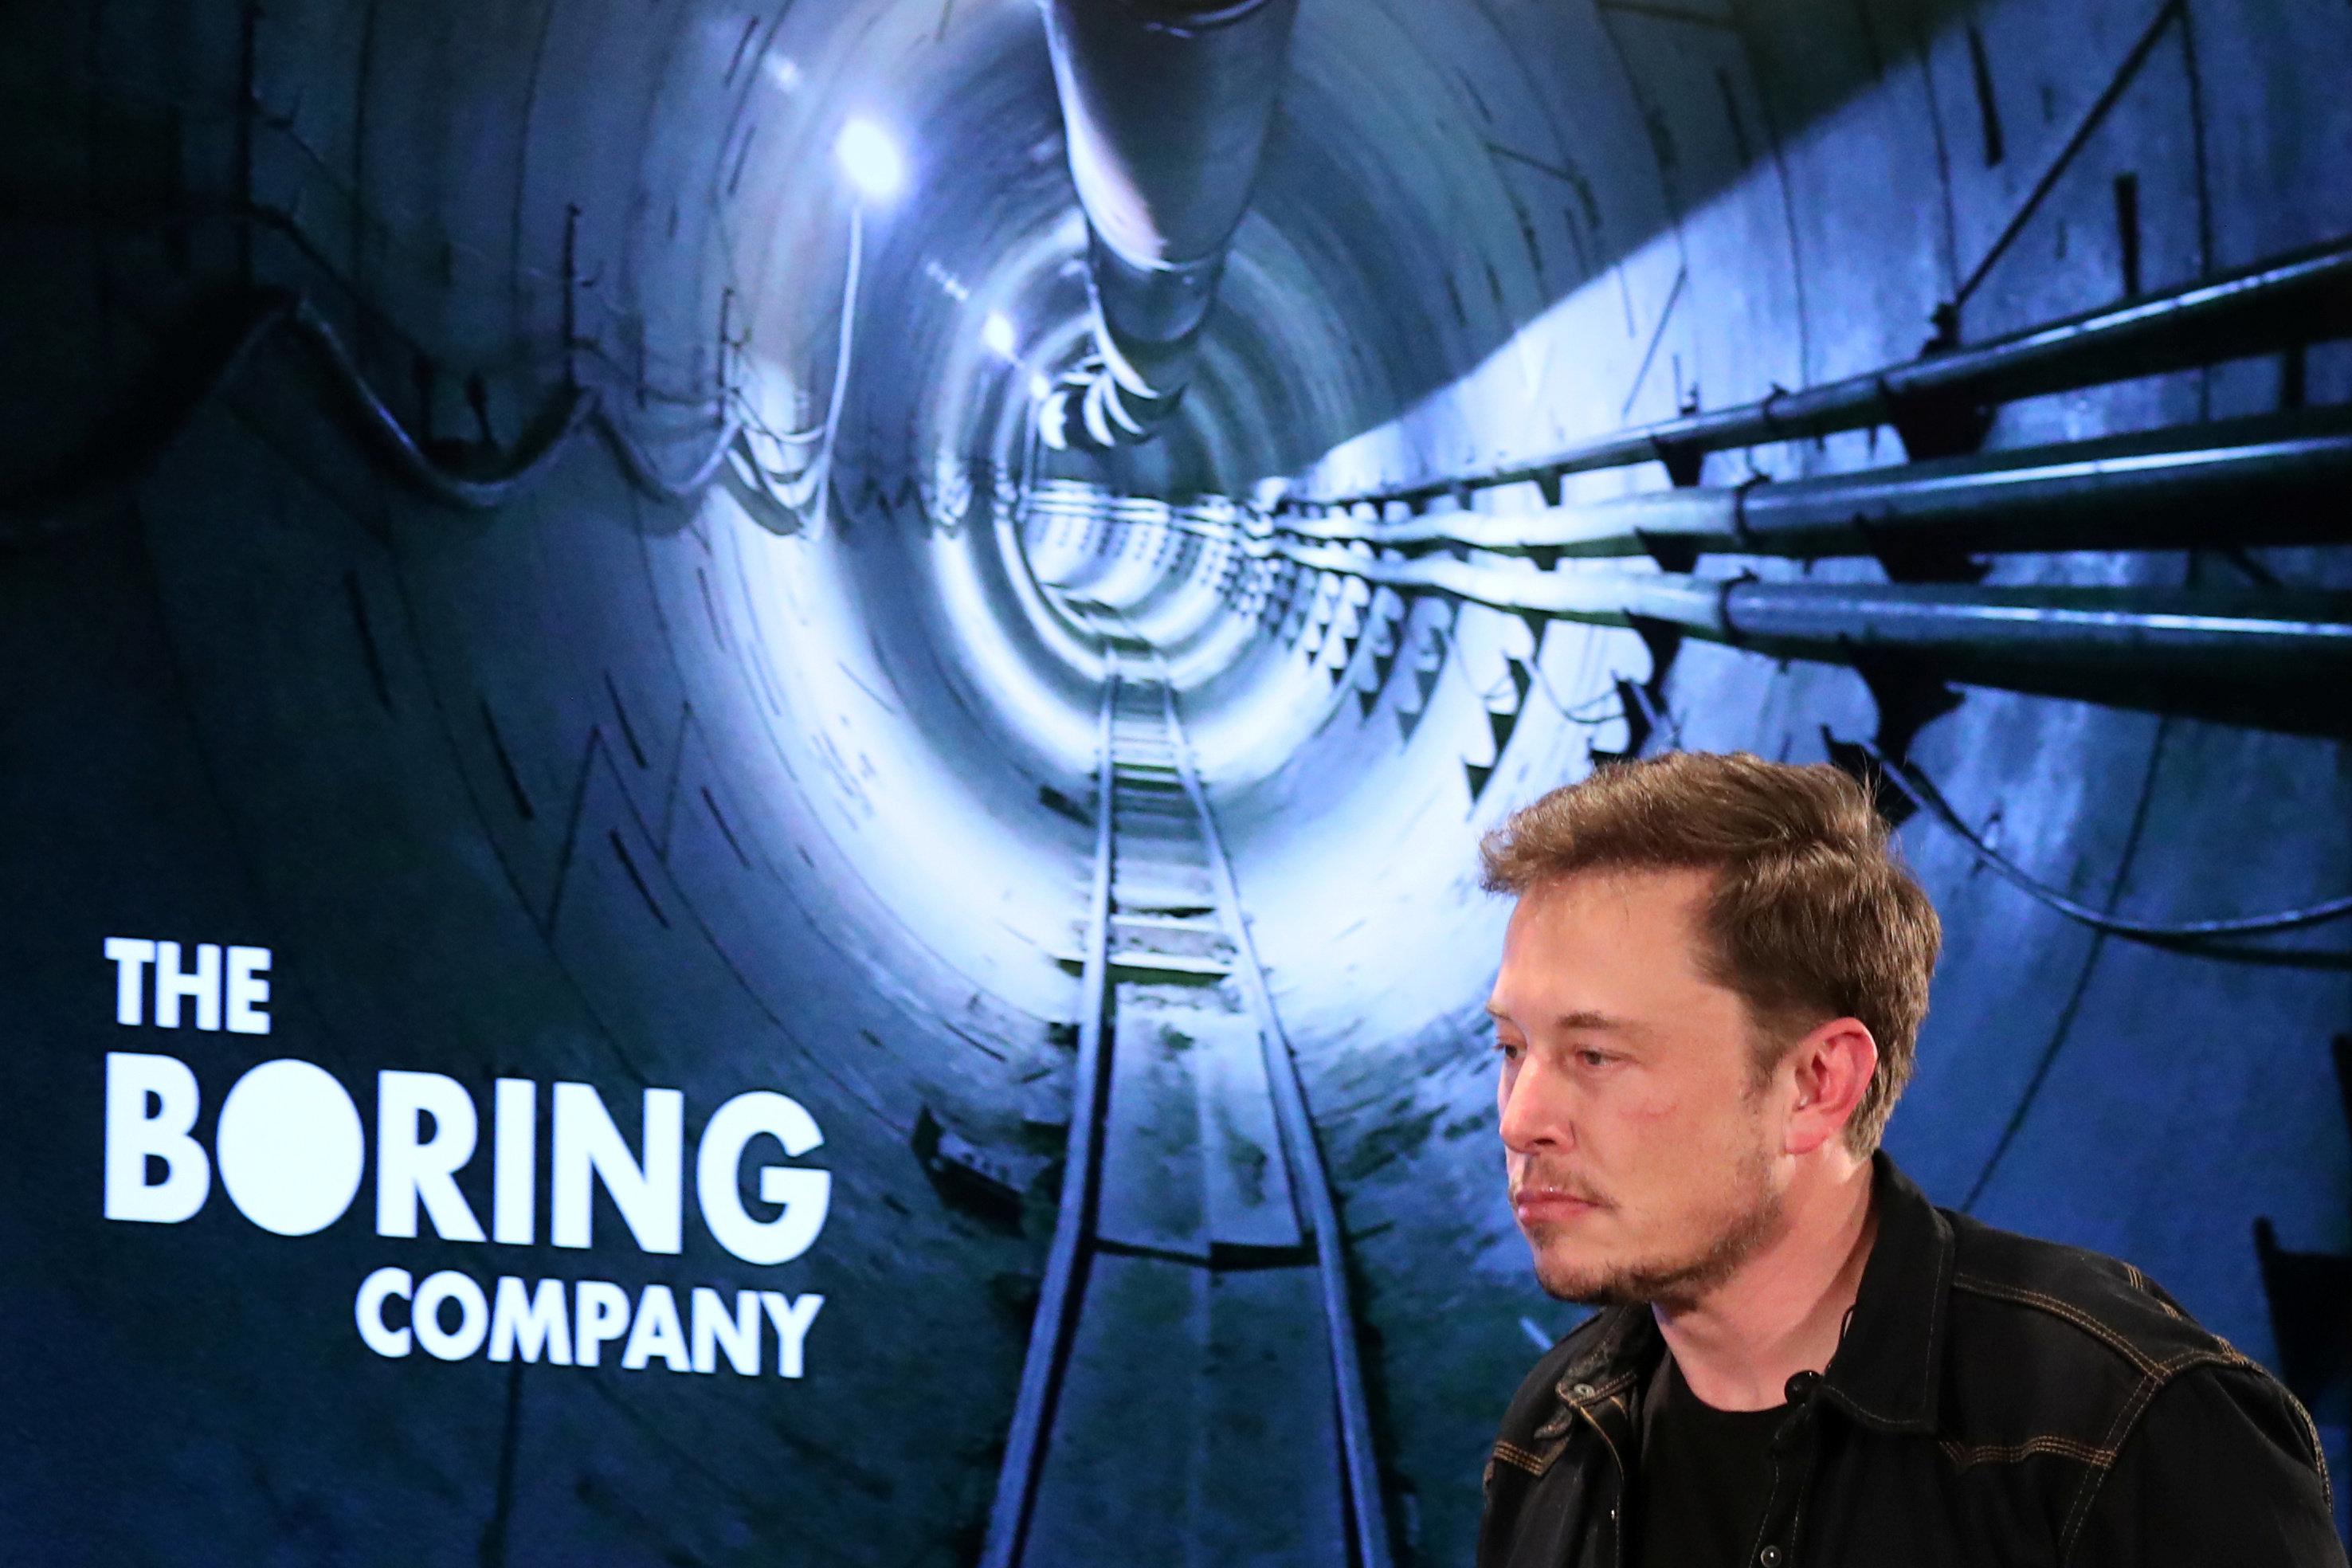 Elon Musk arrives to speak at Boring Company community meeting in Bel Air, Los Angeles, California, U.S. May 17, 2018. REUTERS/Lucy Nicholson